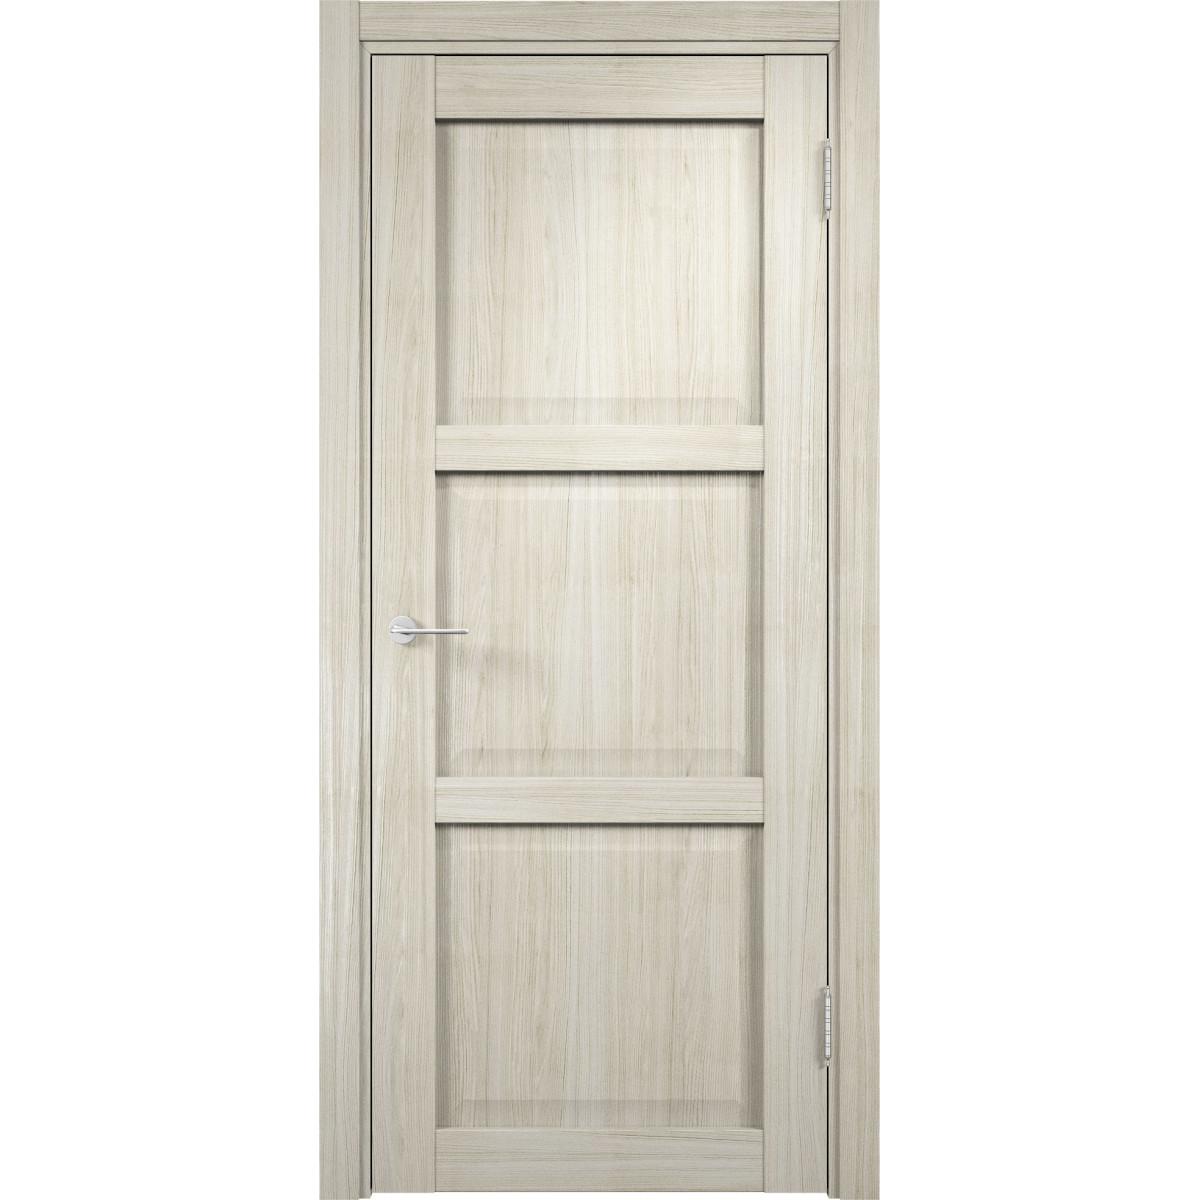 Дверное полотно Casaporte Рома МП_0092 2000х700х44 мм МДФ